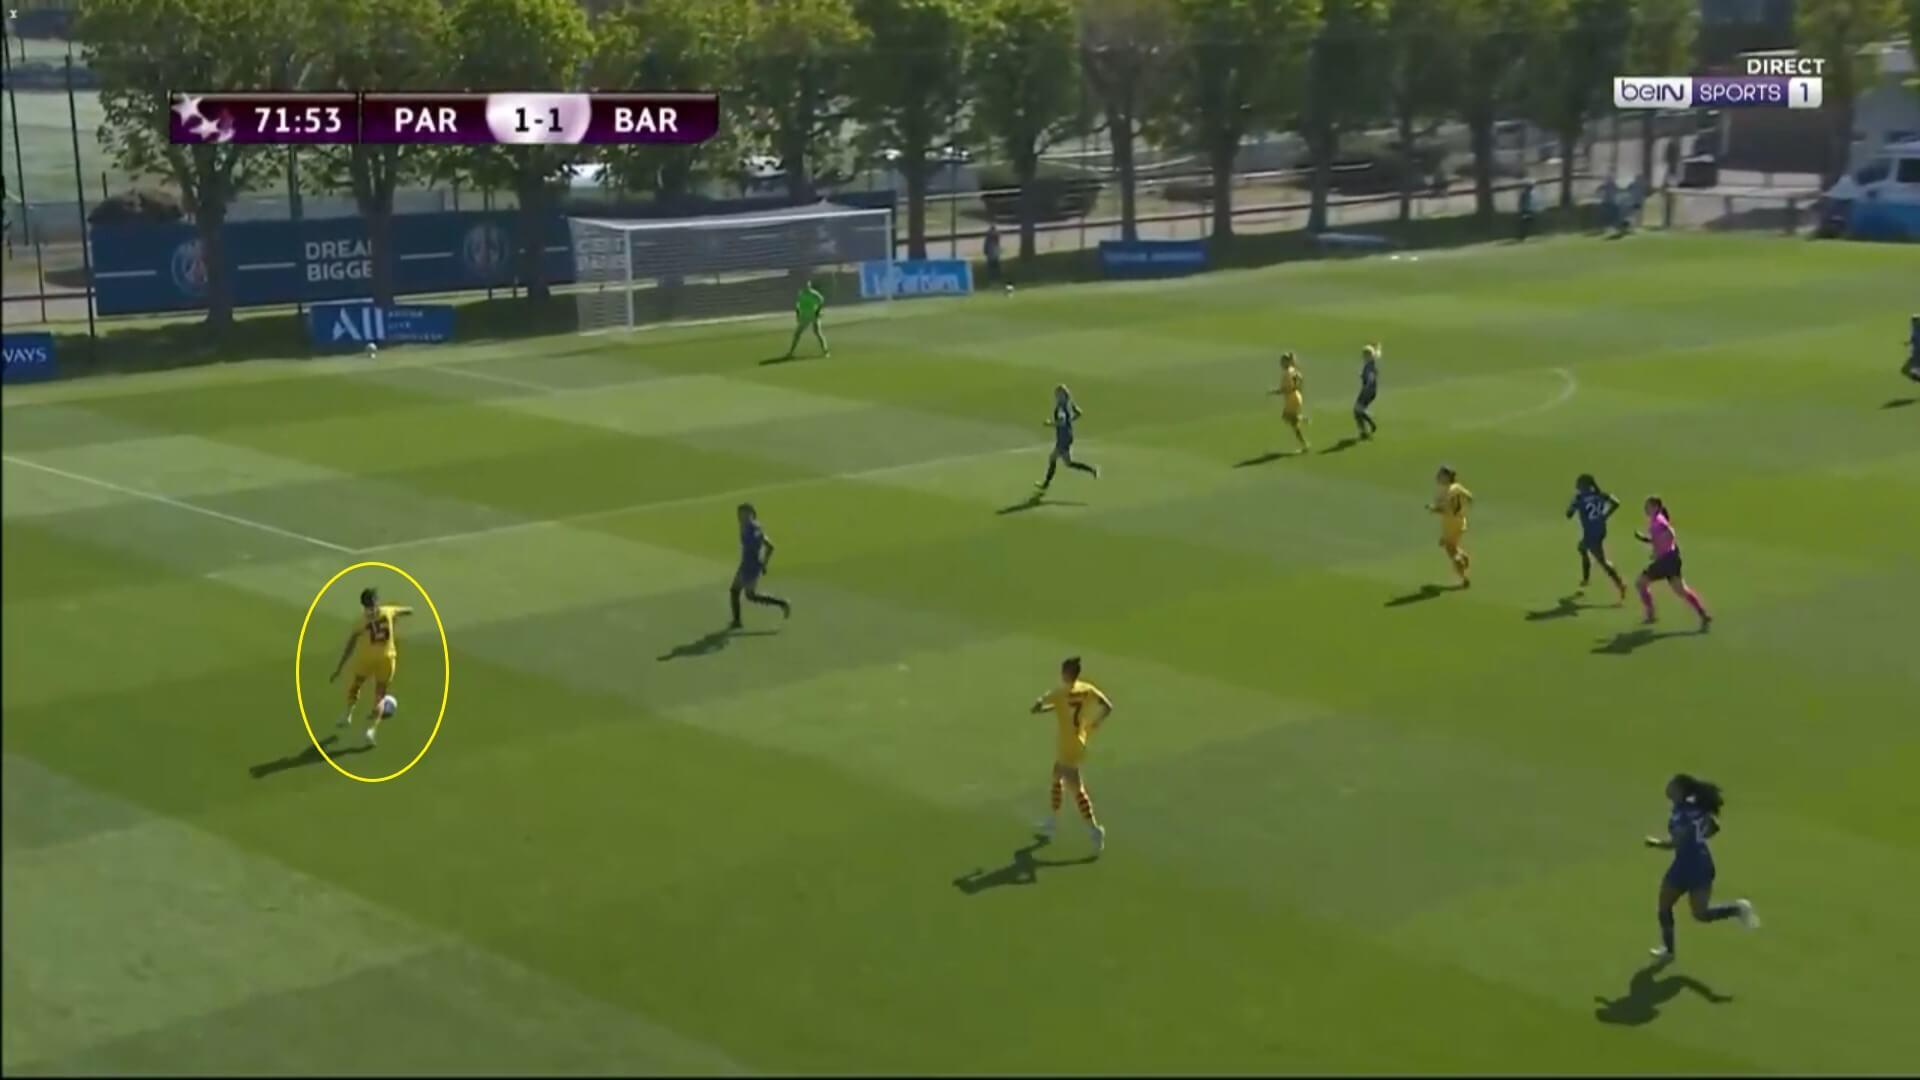 UEFA Women's Champions League 2020/2021: PSG Feminine v Barcelona Femeni - tactical analysis tactics